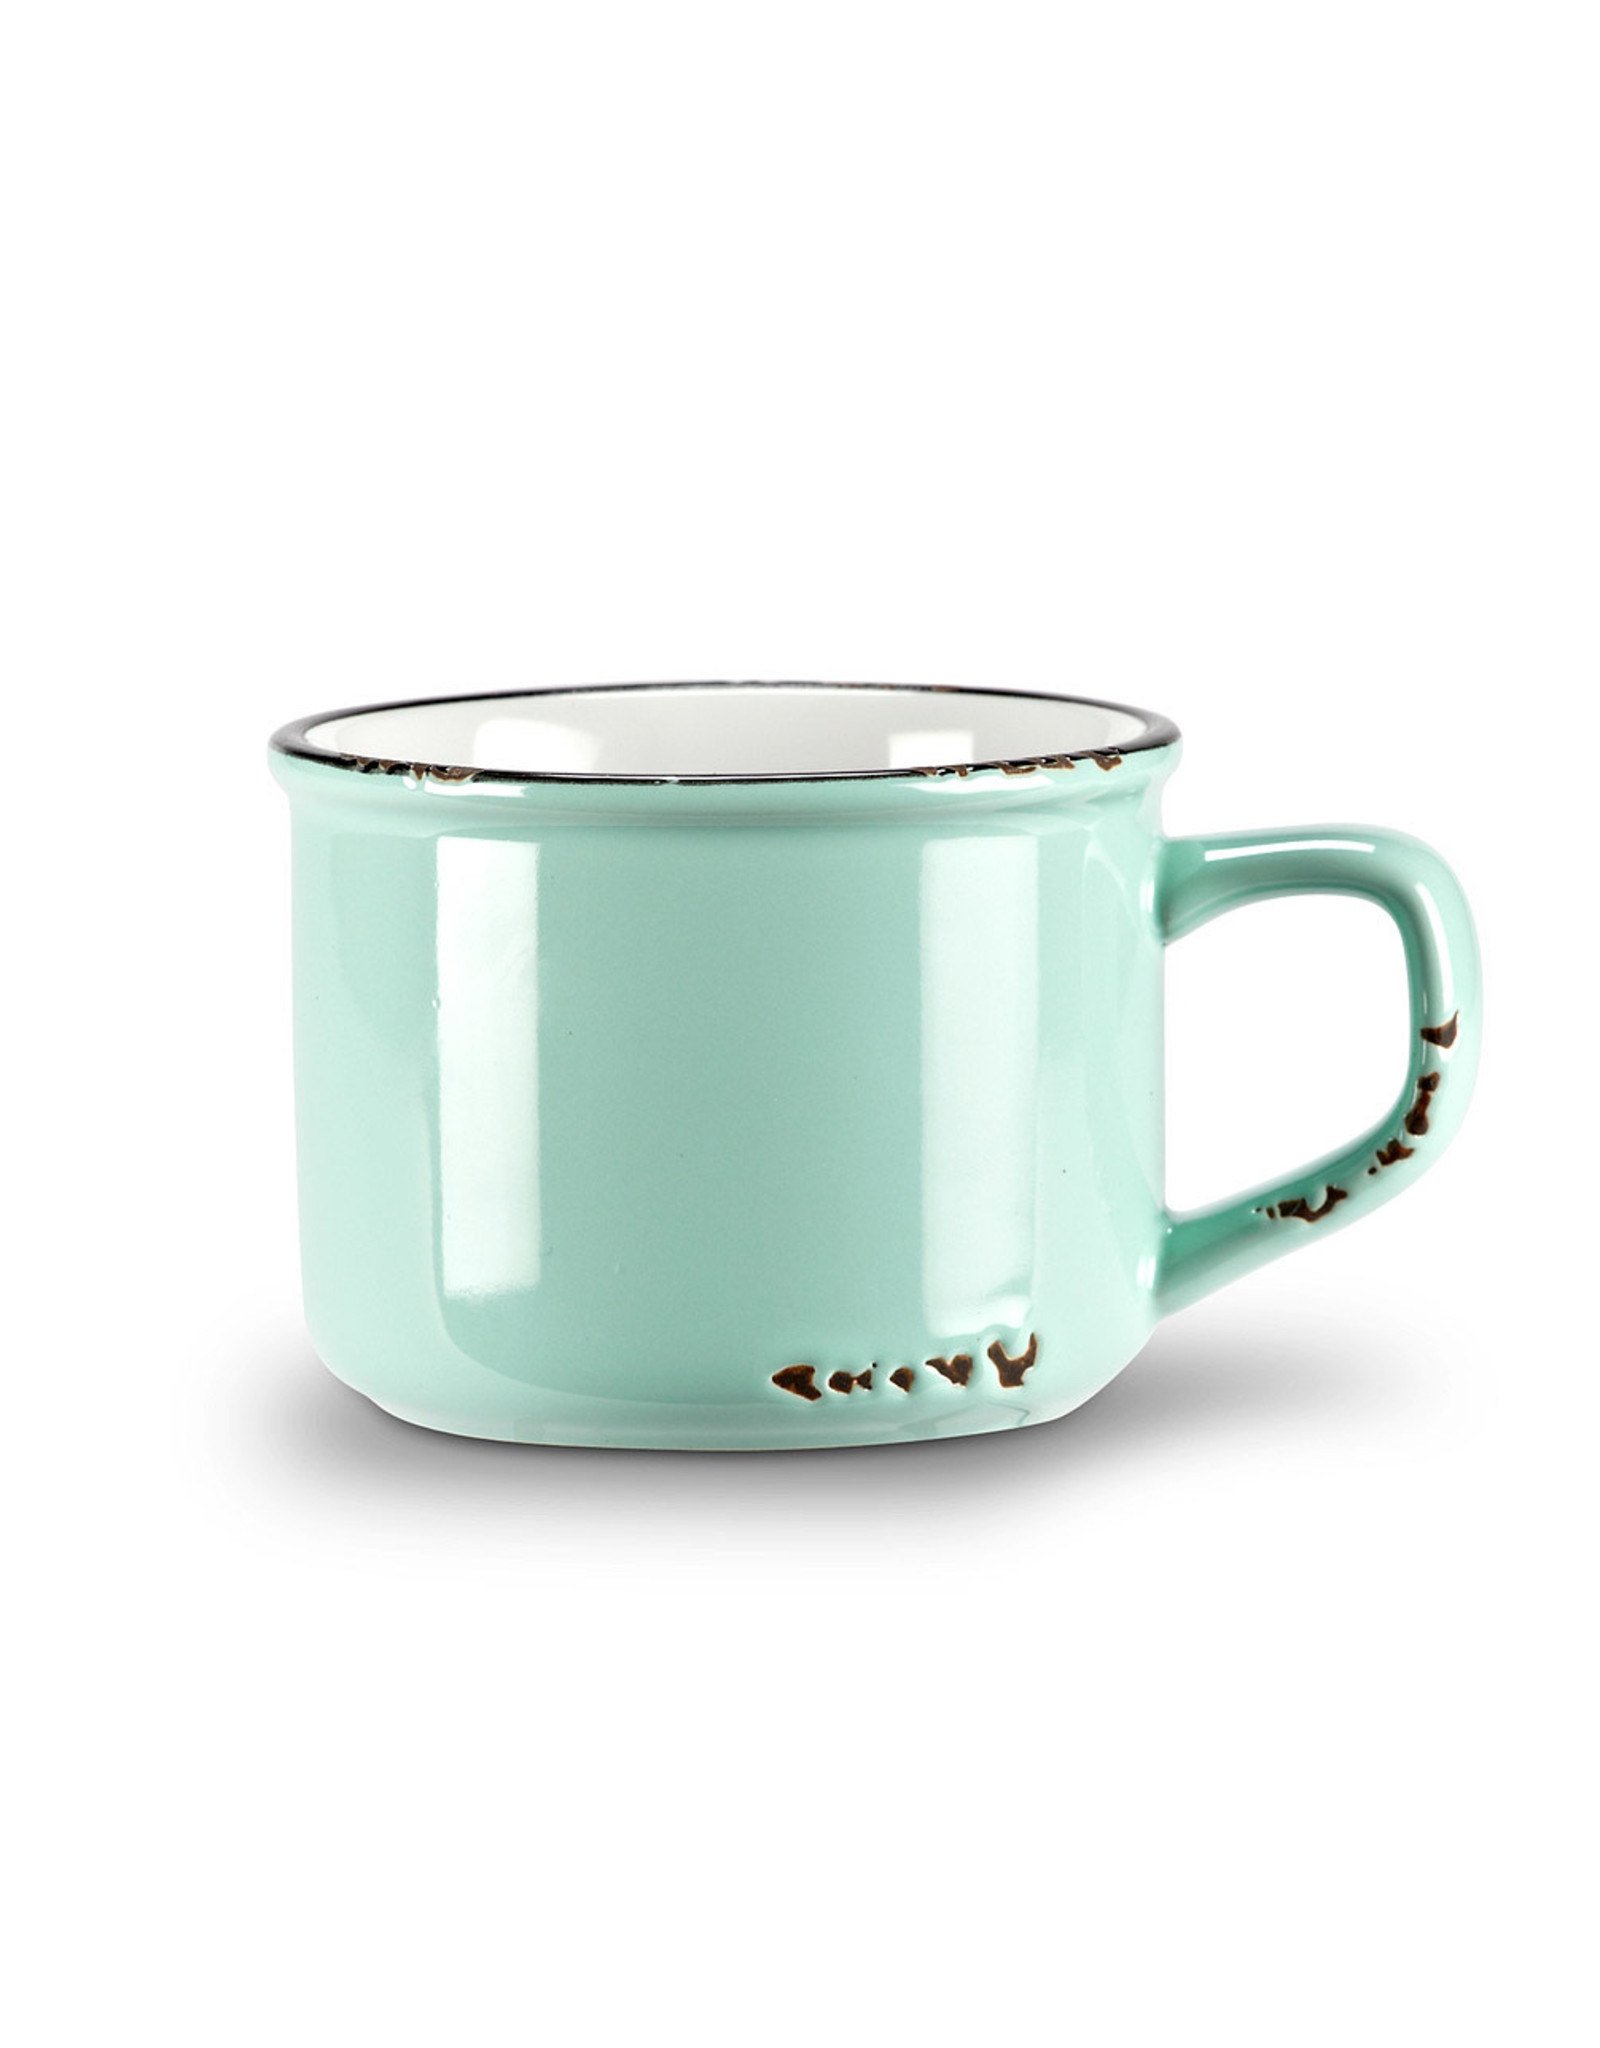 Tasse cappuccino menthe en grès (8 oz)